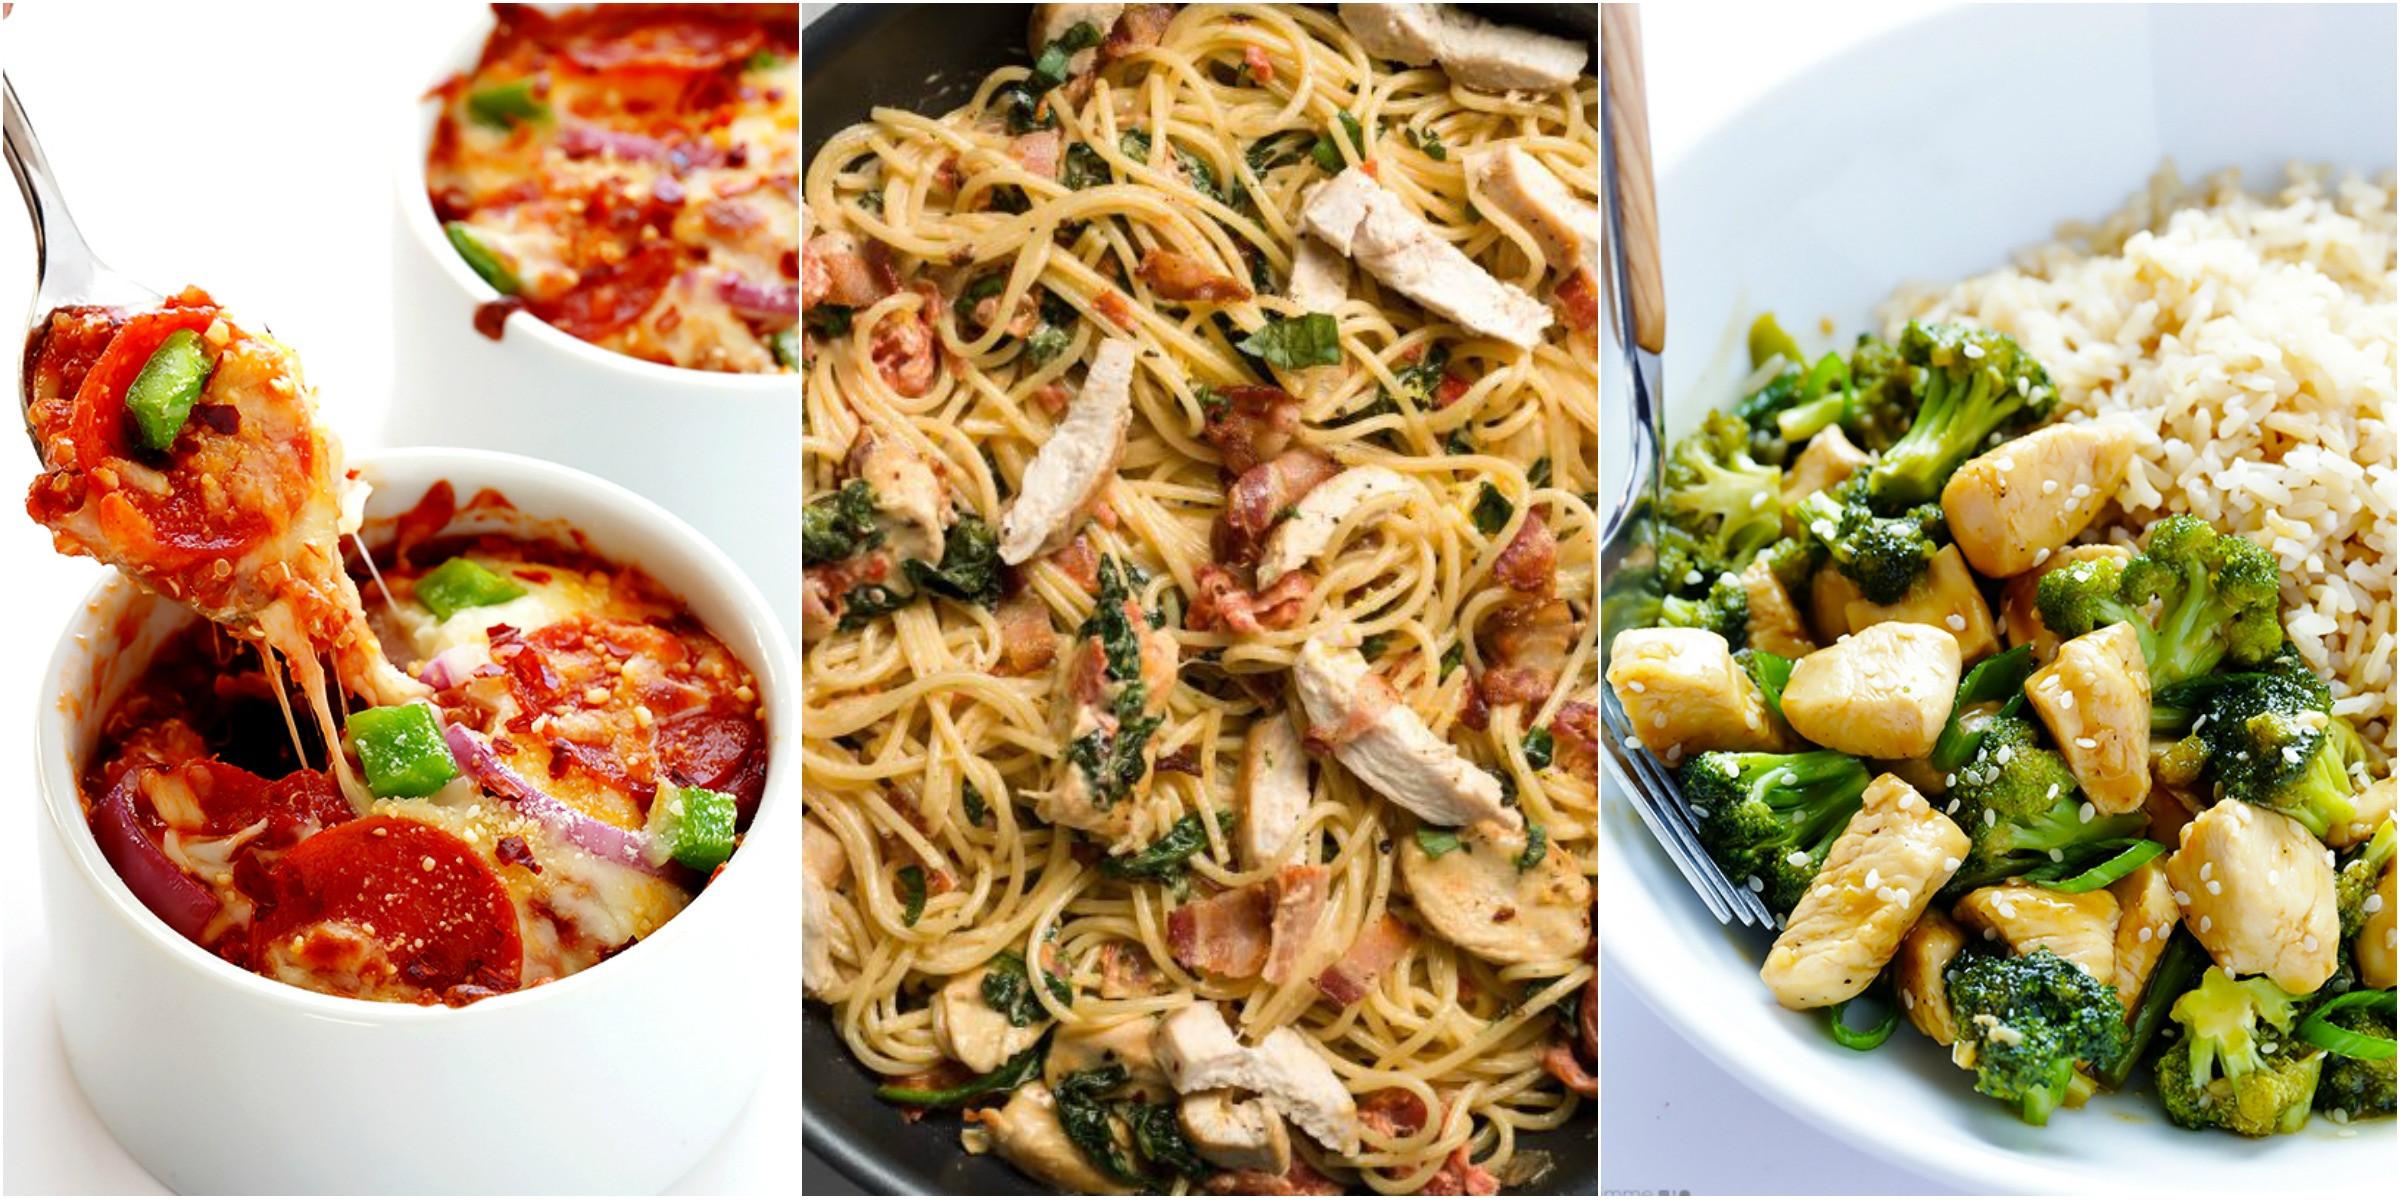 Good Dinner Ideas  20 Quick & Easy Dinner Ideas Recipes for Fast Family